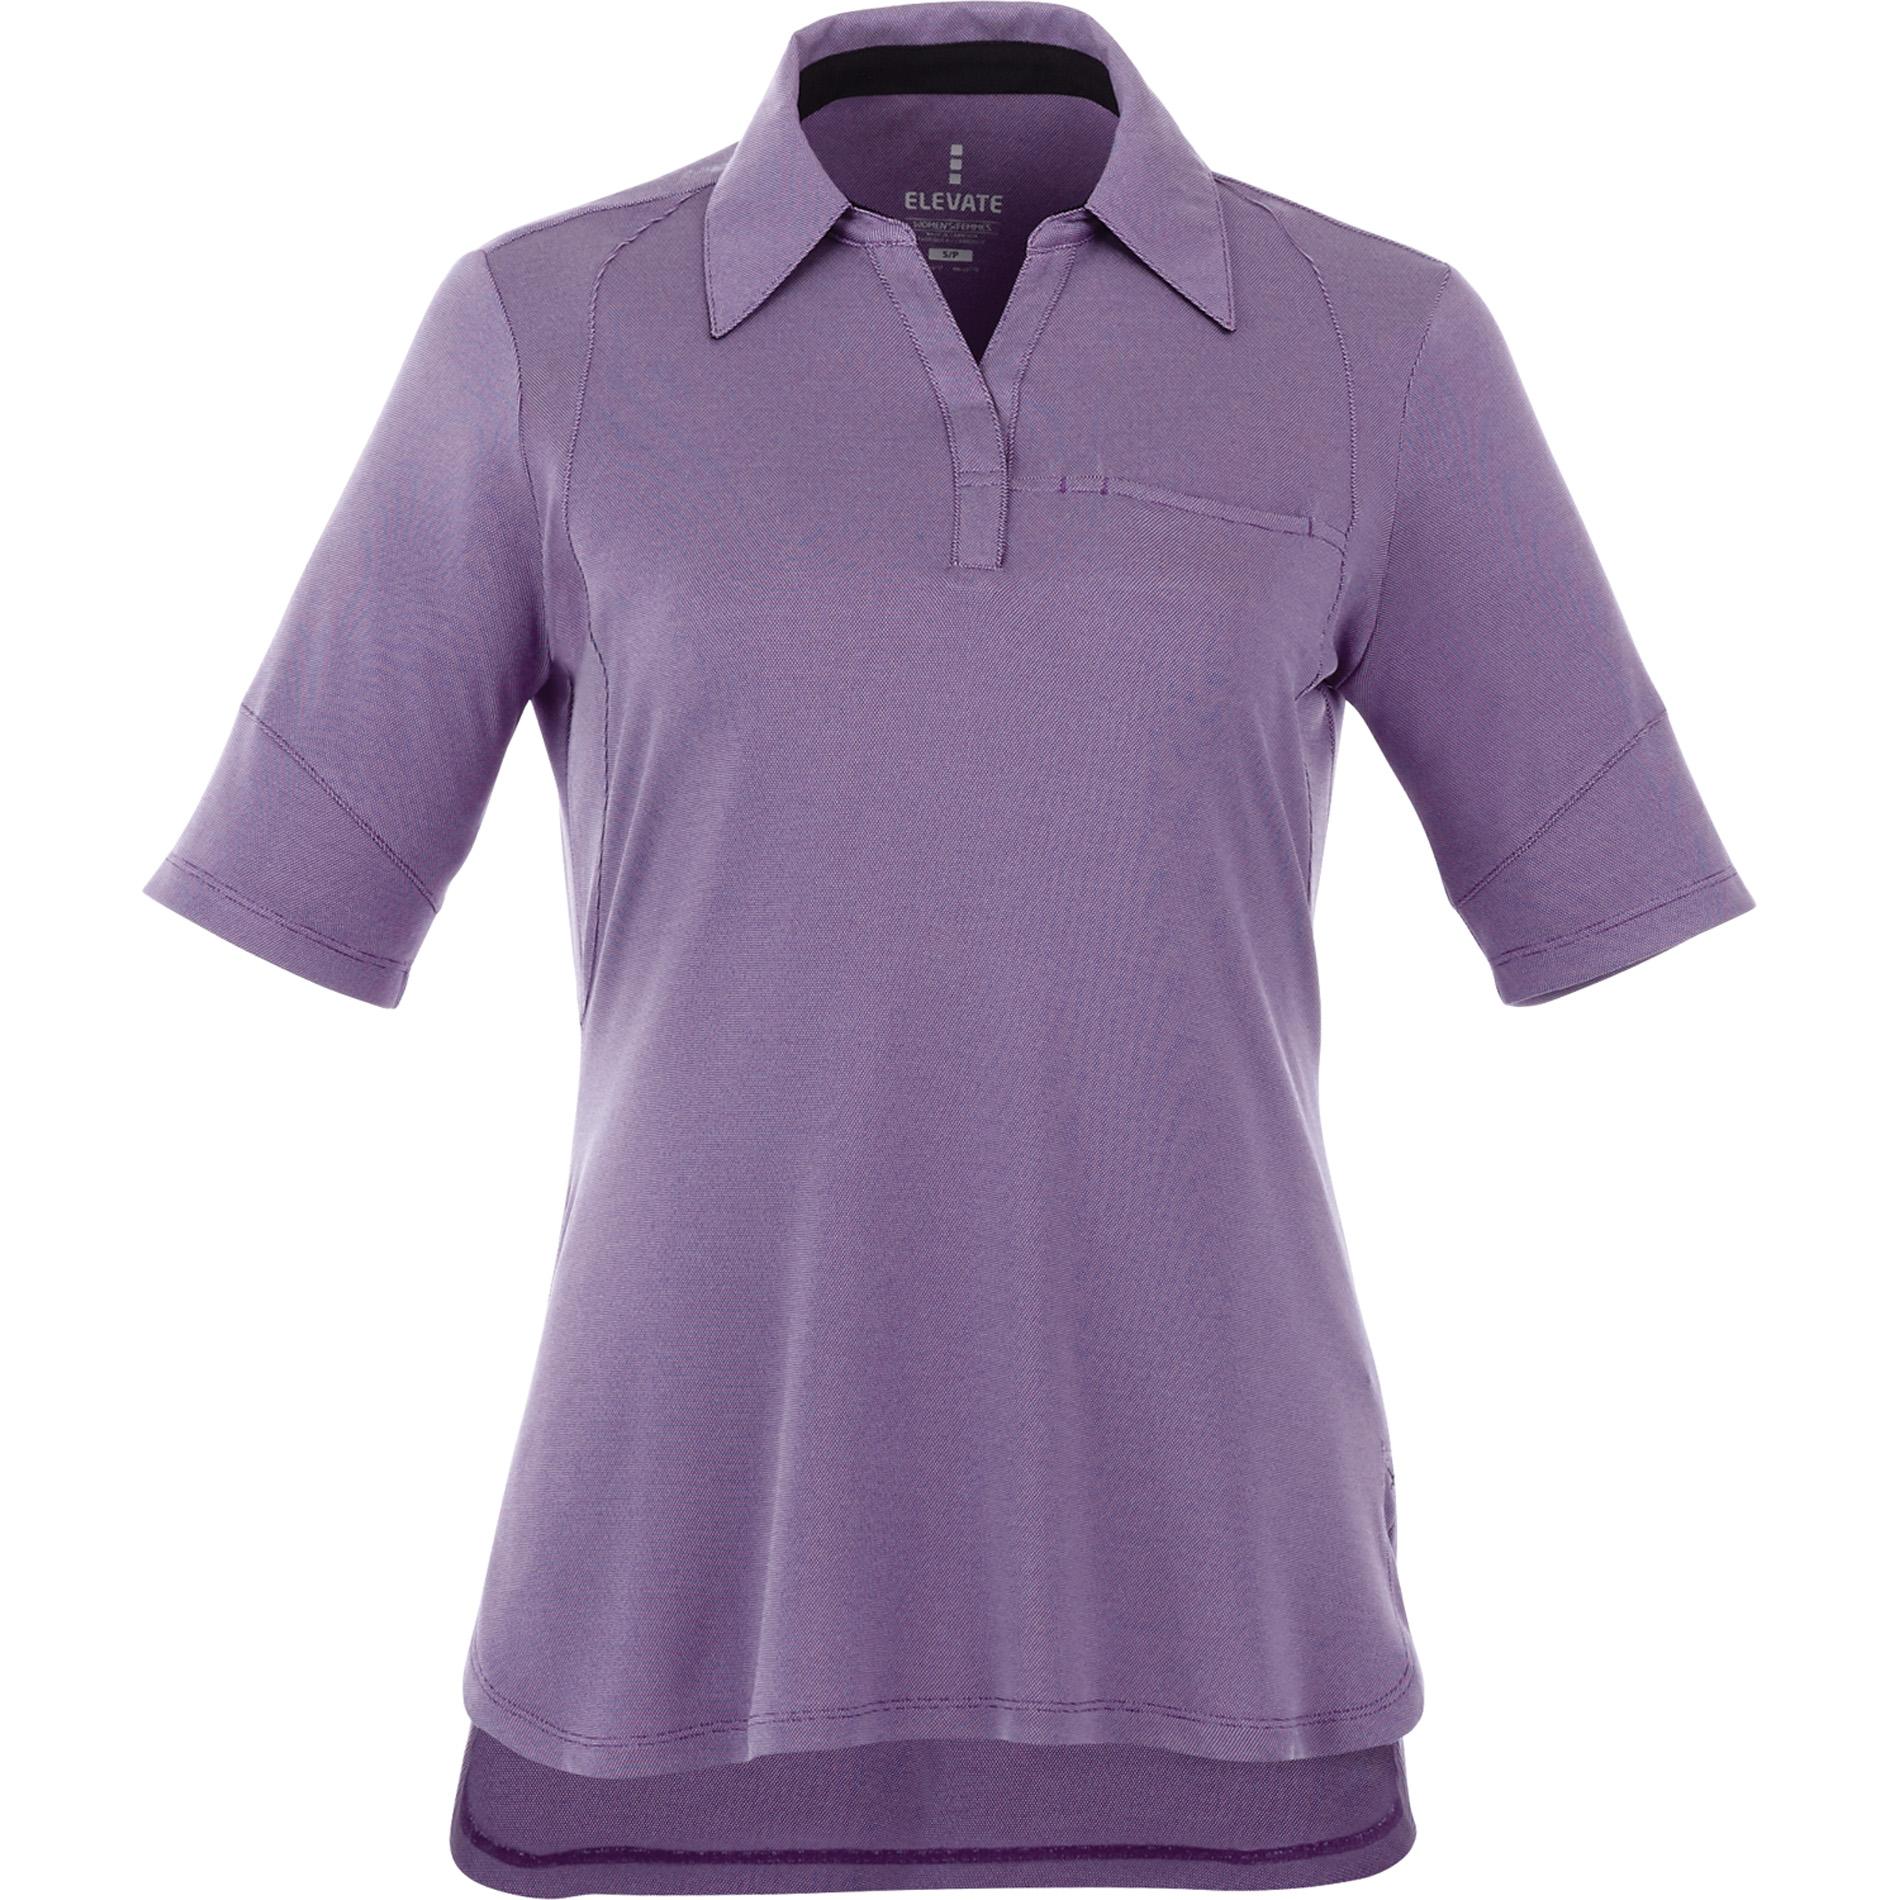 Elevate TM96509 - Women's TORRES Short Sleeve Polo